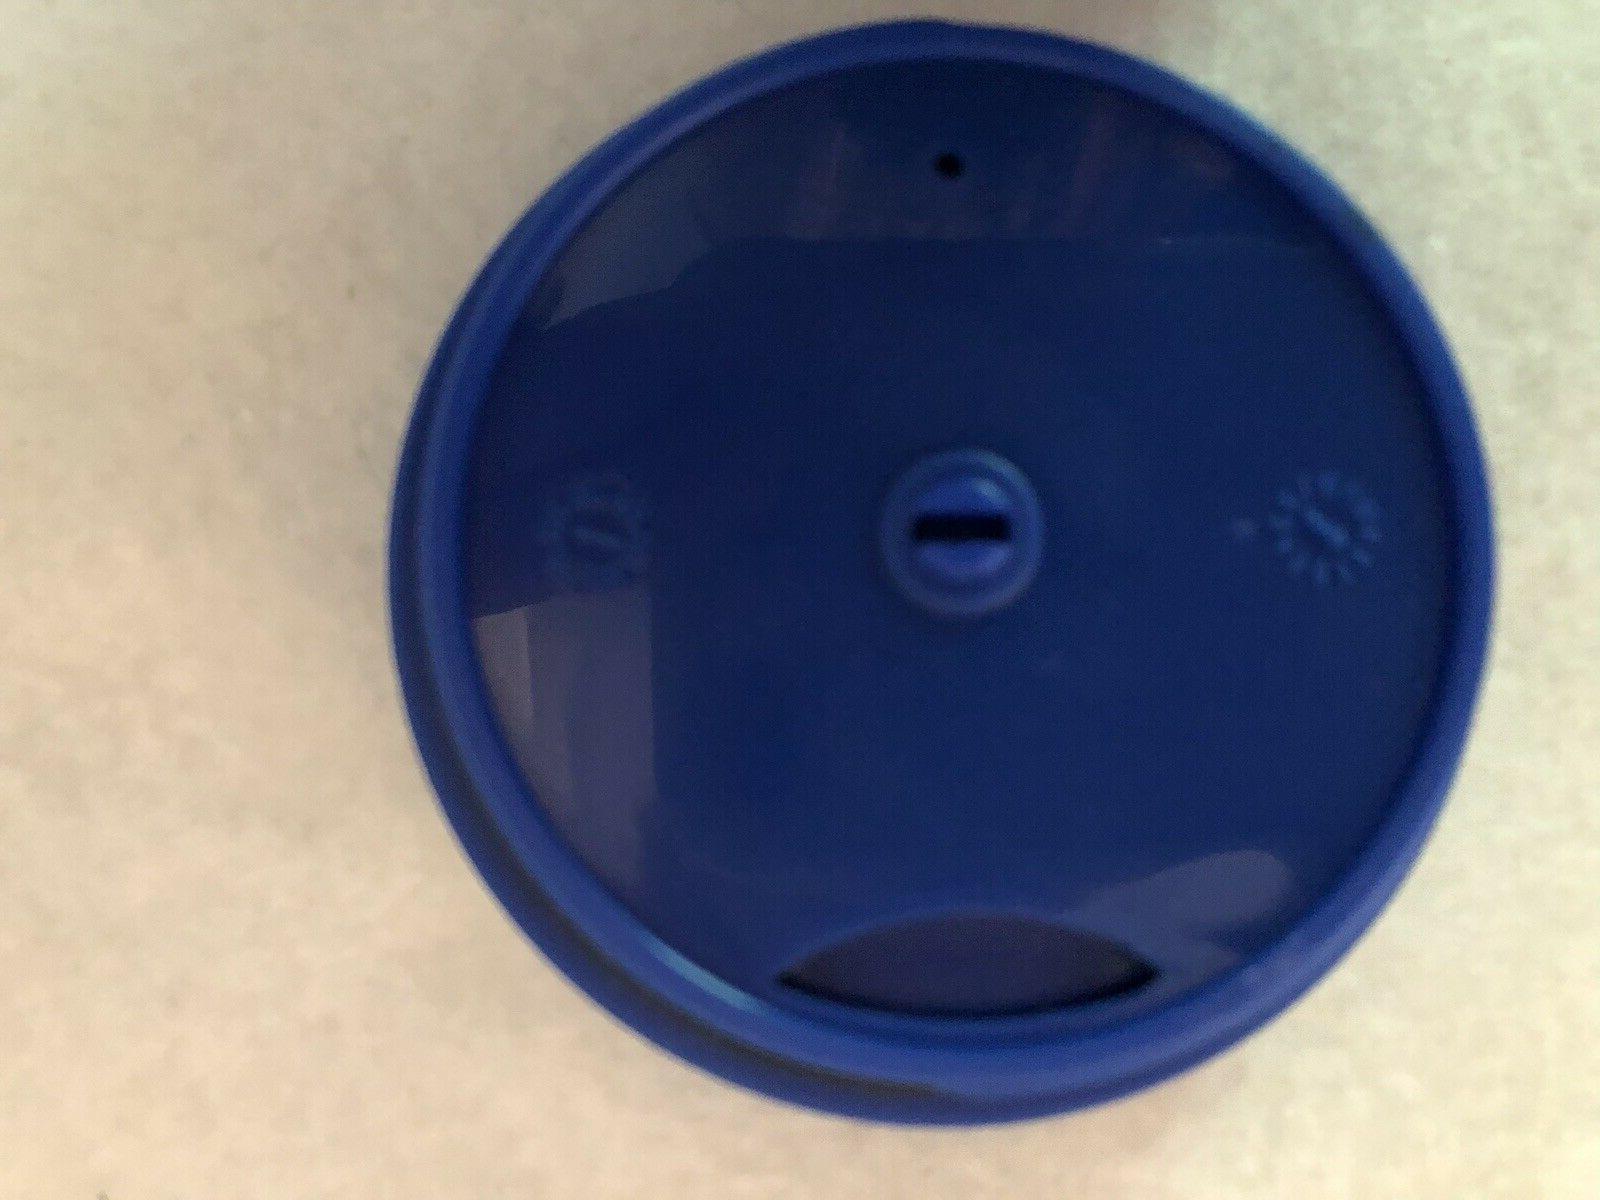 NOS Aladdin 16 Mug Cup Photo -2006